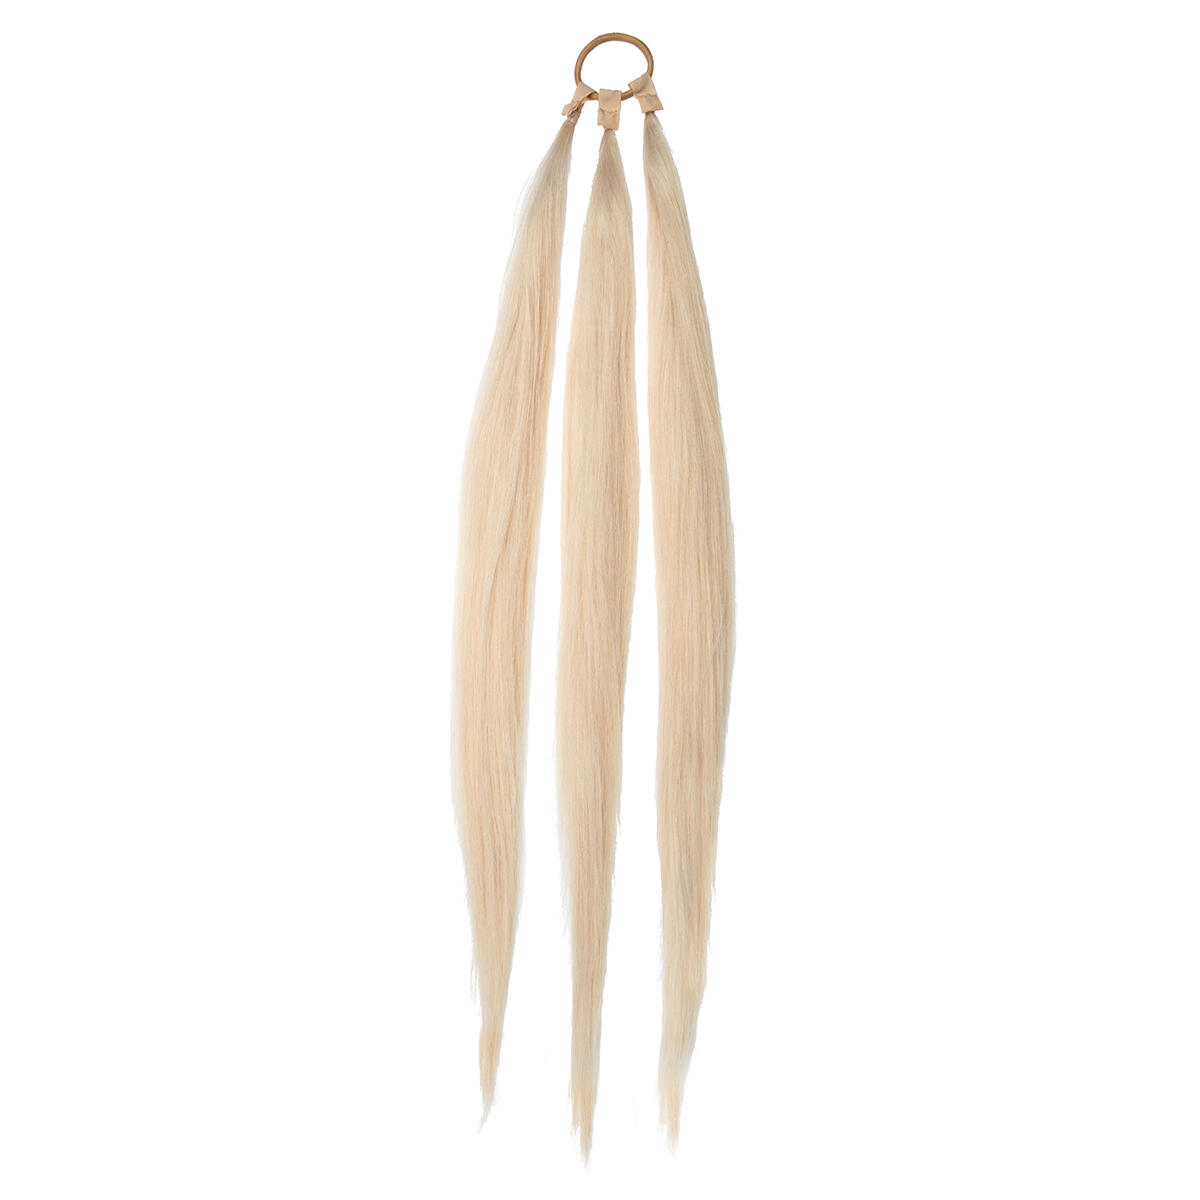 Easy Braid Original 10.8 Light Blonde 55 cm